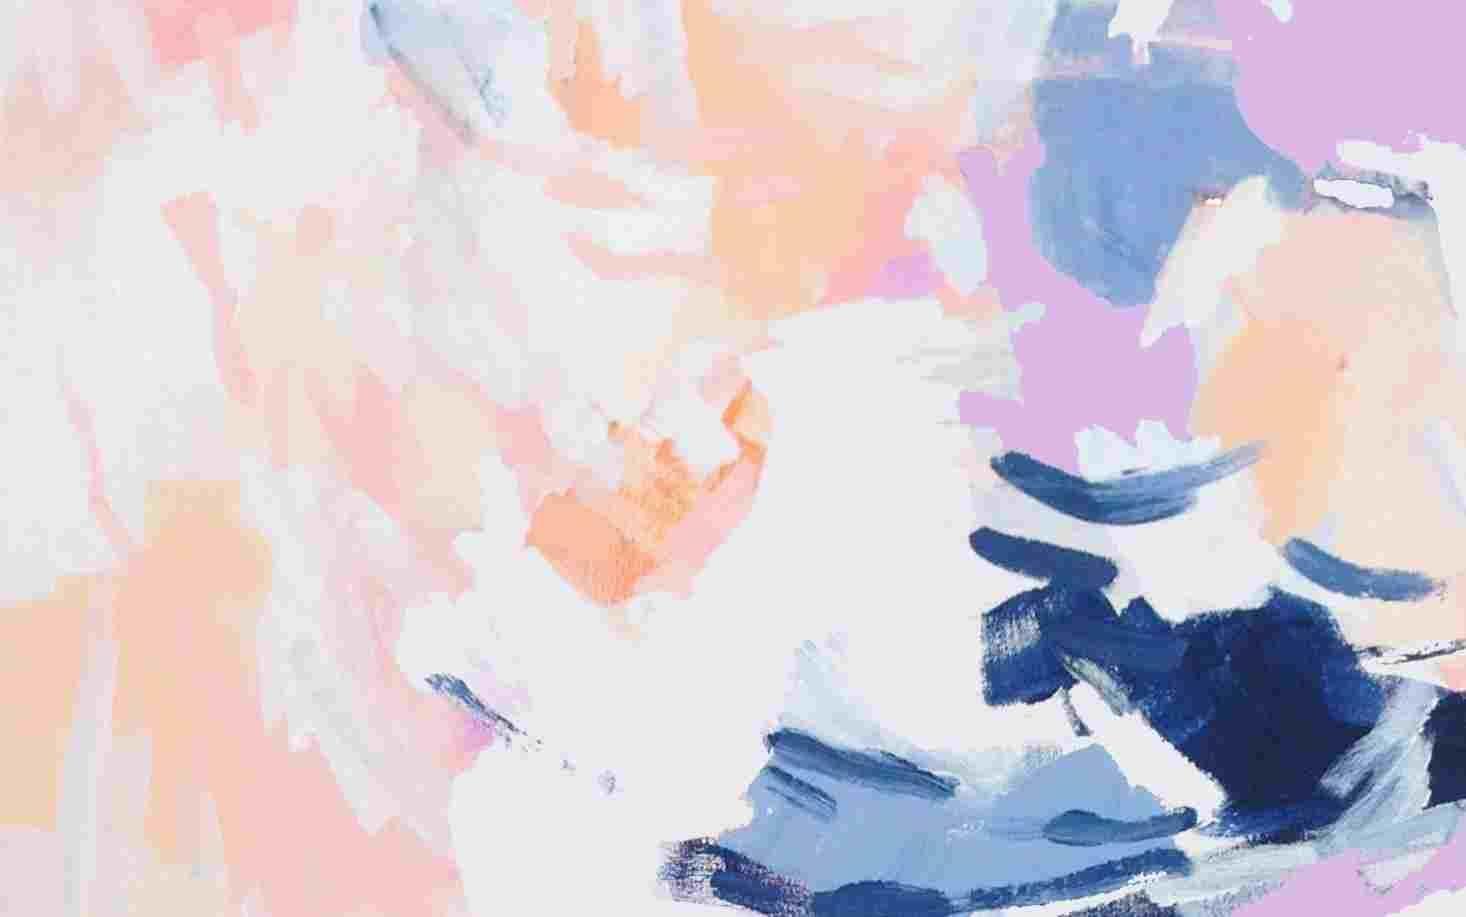 Aesthetic Mac Wallpapers Top Free Aesthetic Mac Backgrounds